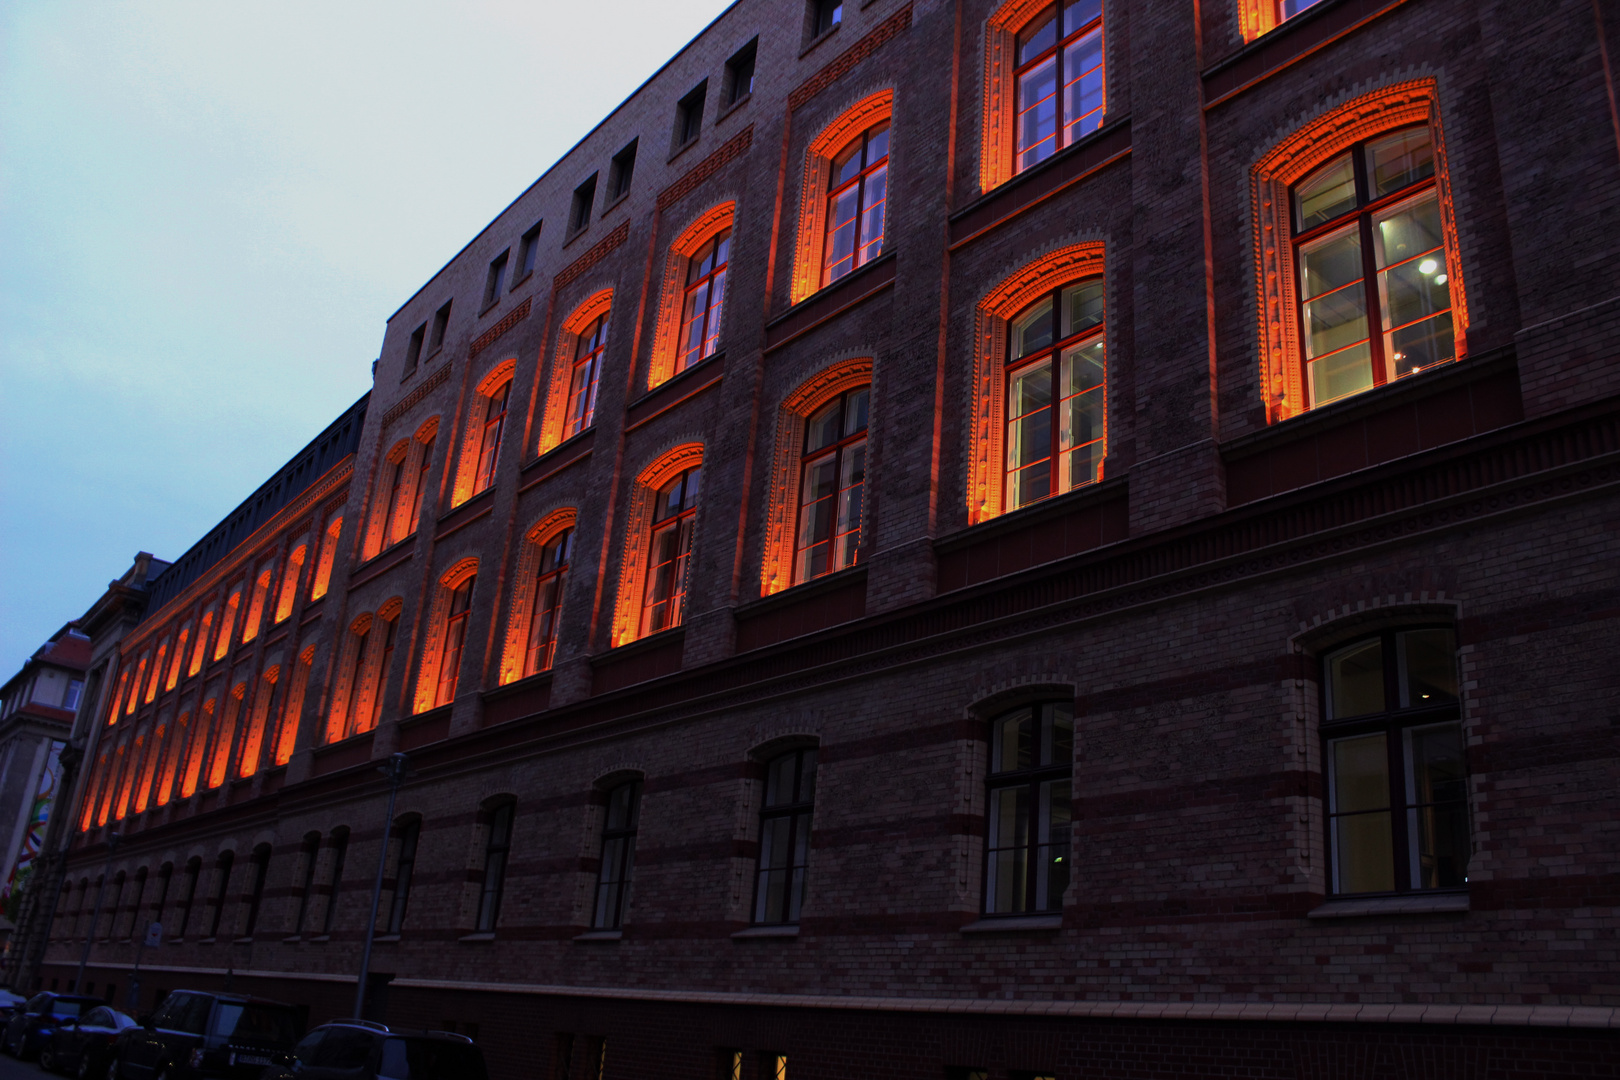 Abendbeleuchtung